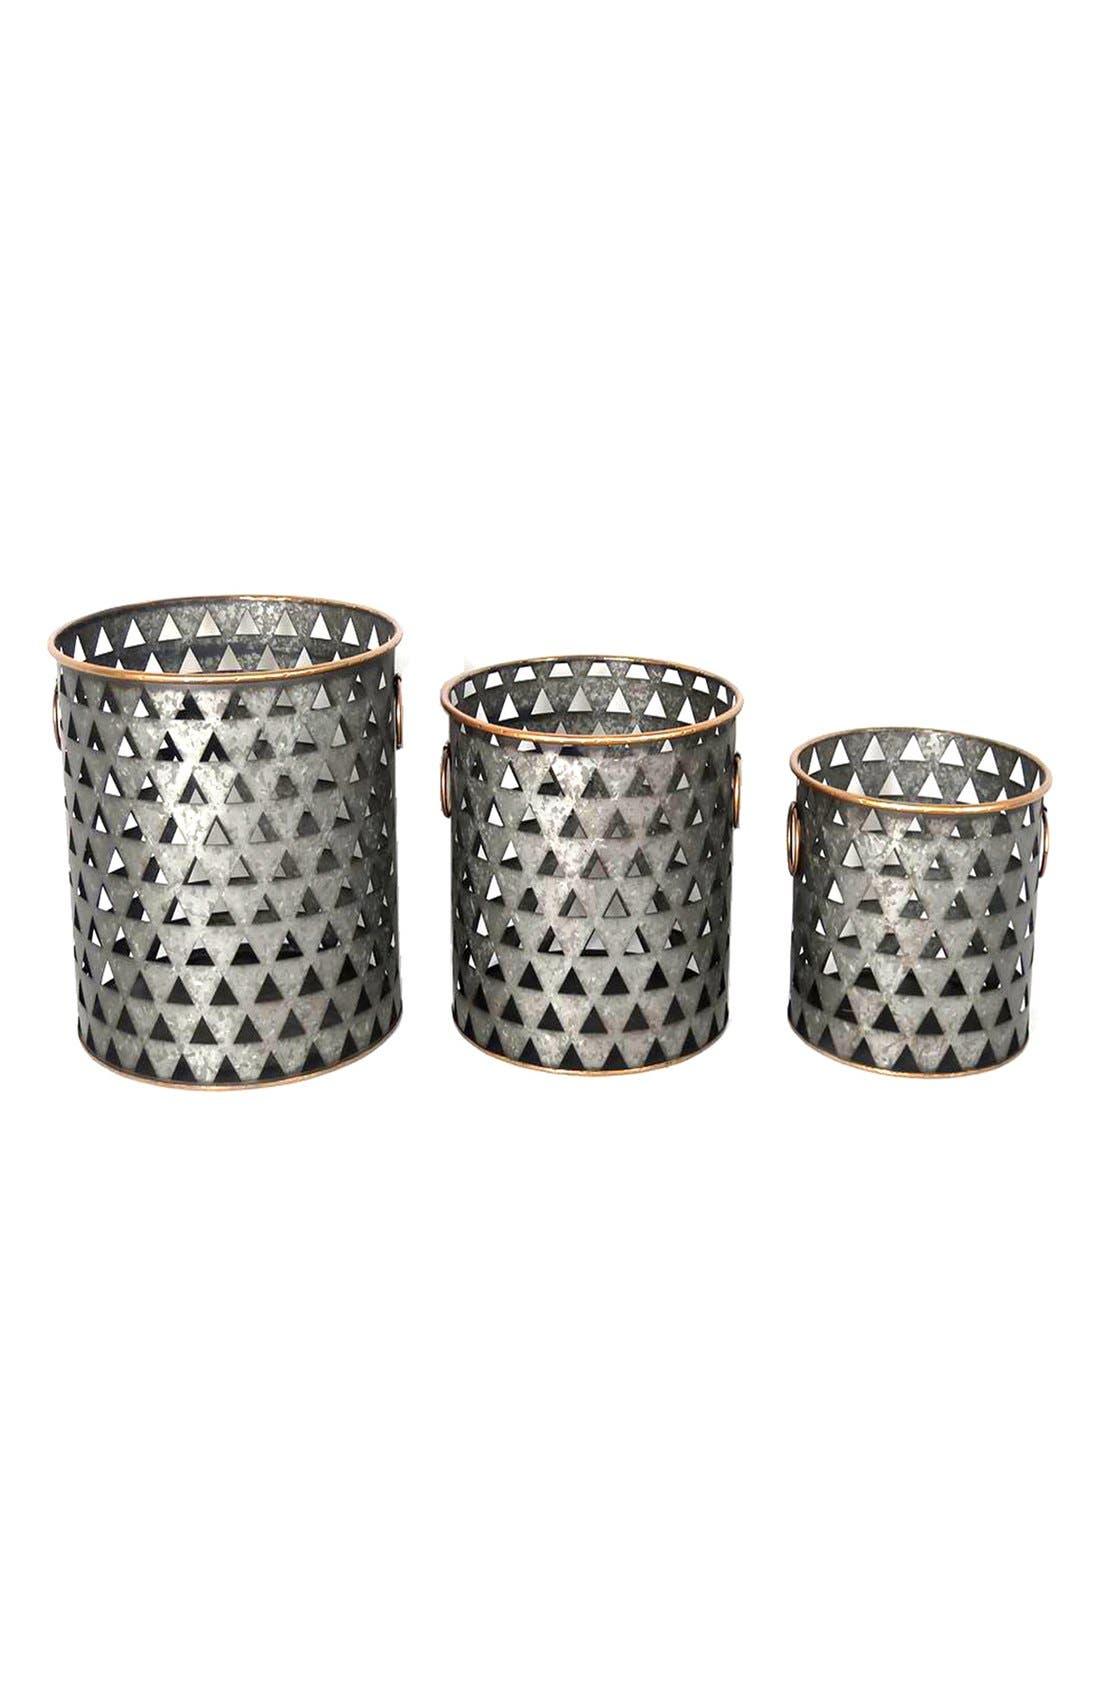 Main Image - Crystal Art Gallery Metal Baskets (Set of 3)